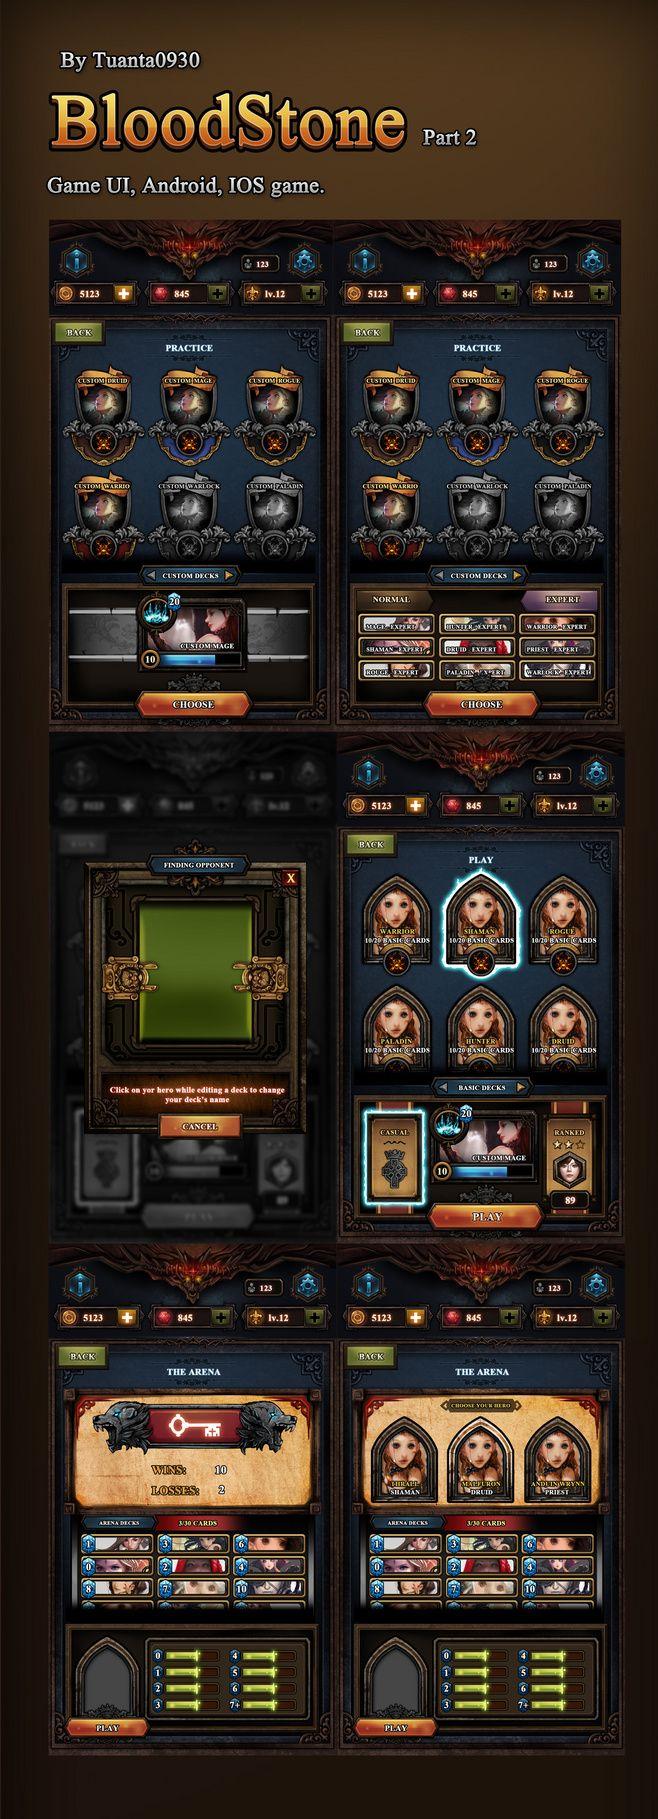 Blood Stone : Reski...@SilenceMo采集到GAME UI(5053图)_花瓣平面设计